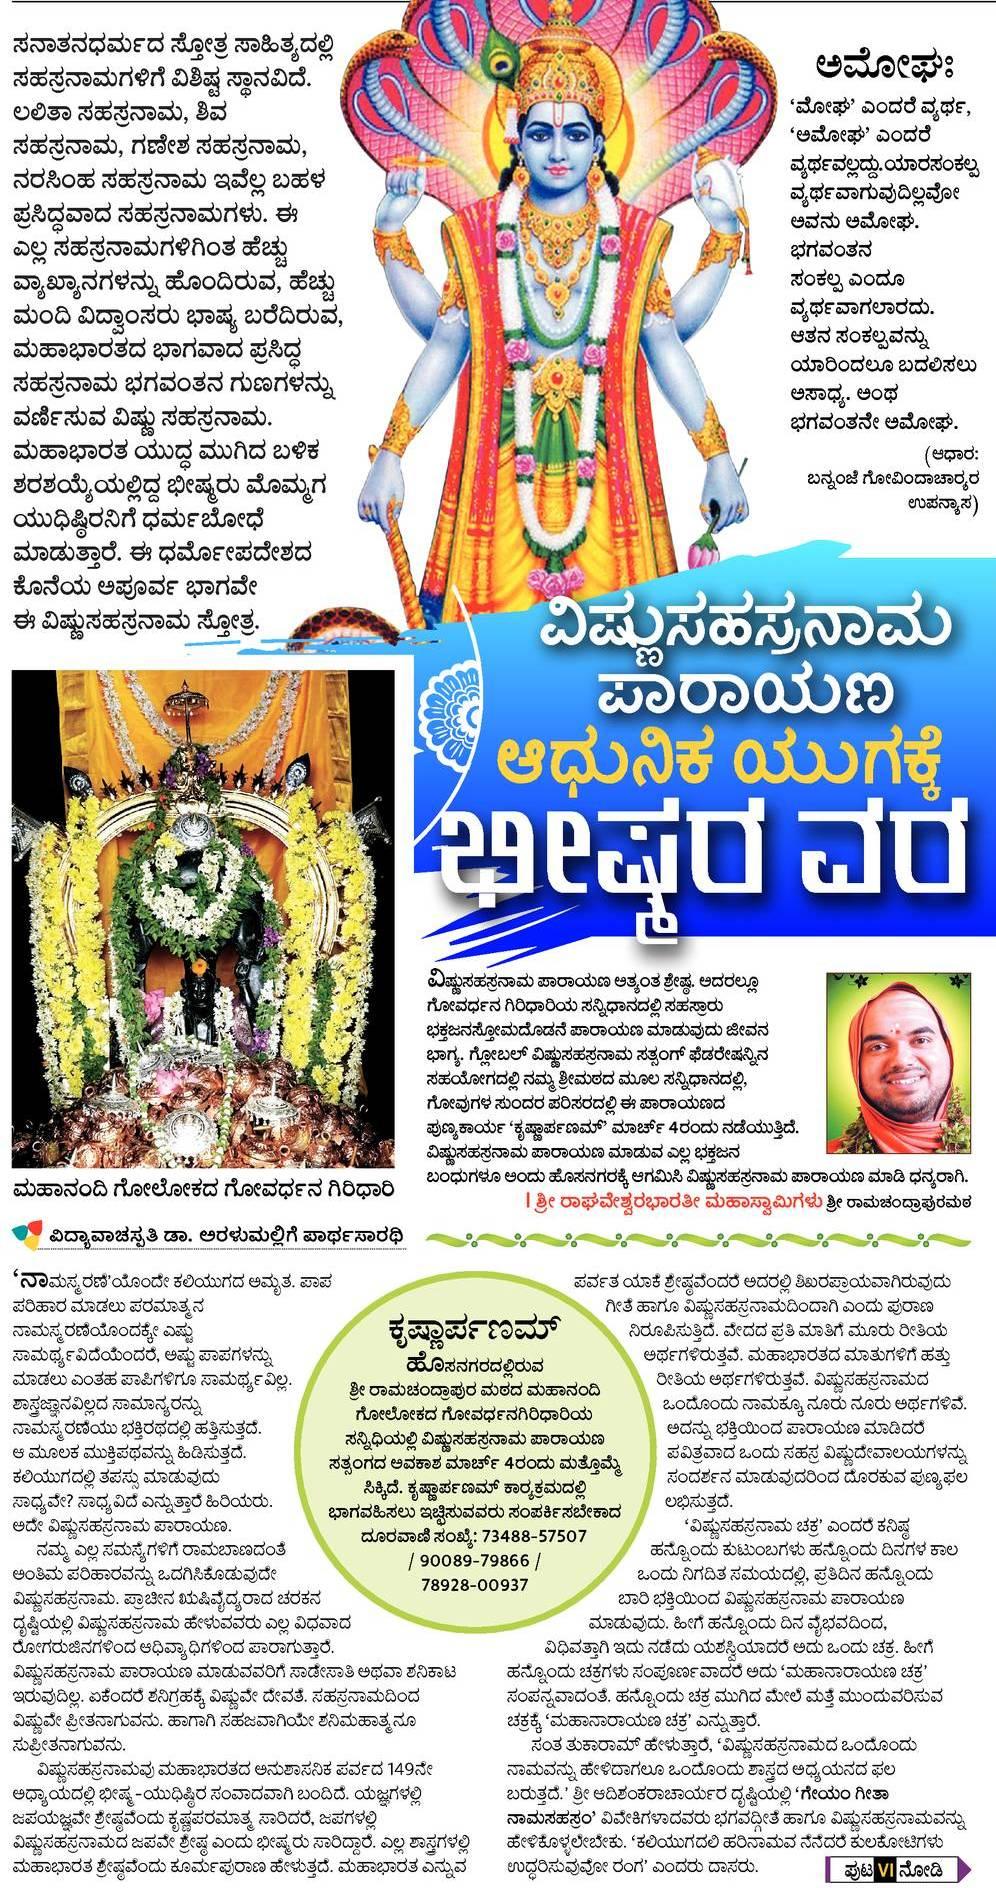 Vishnu Sahasranama (1/2) in 2020 Social share buttons